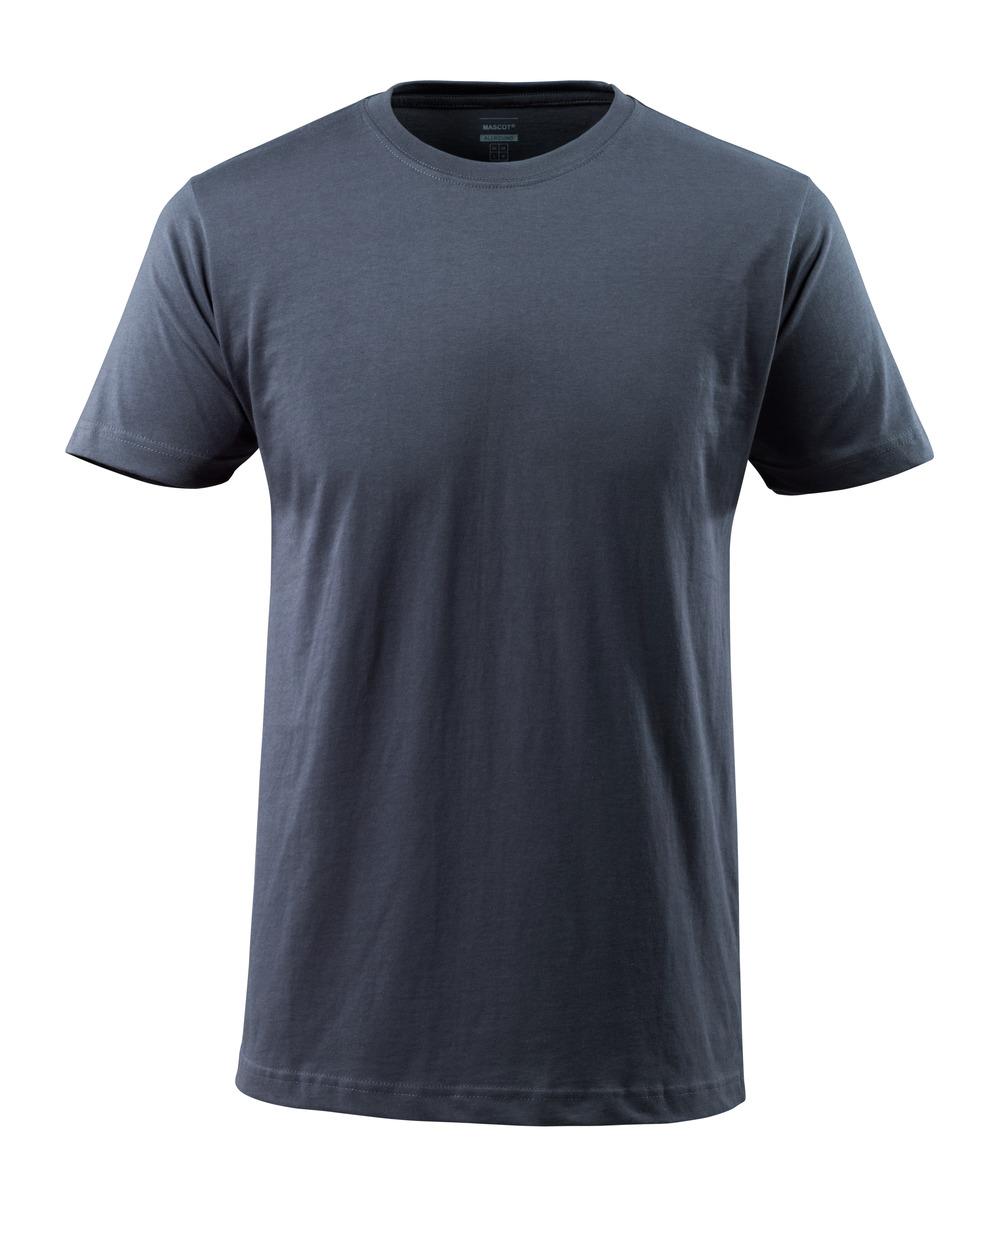 50662-965-010 Camiseta - azul marino oscuro